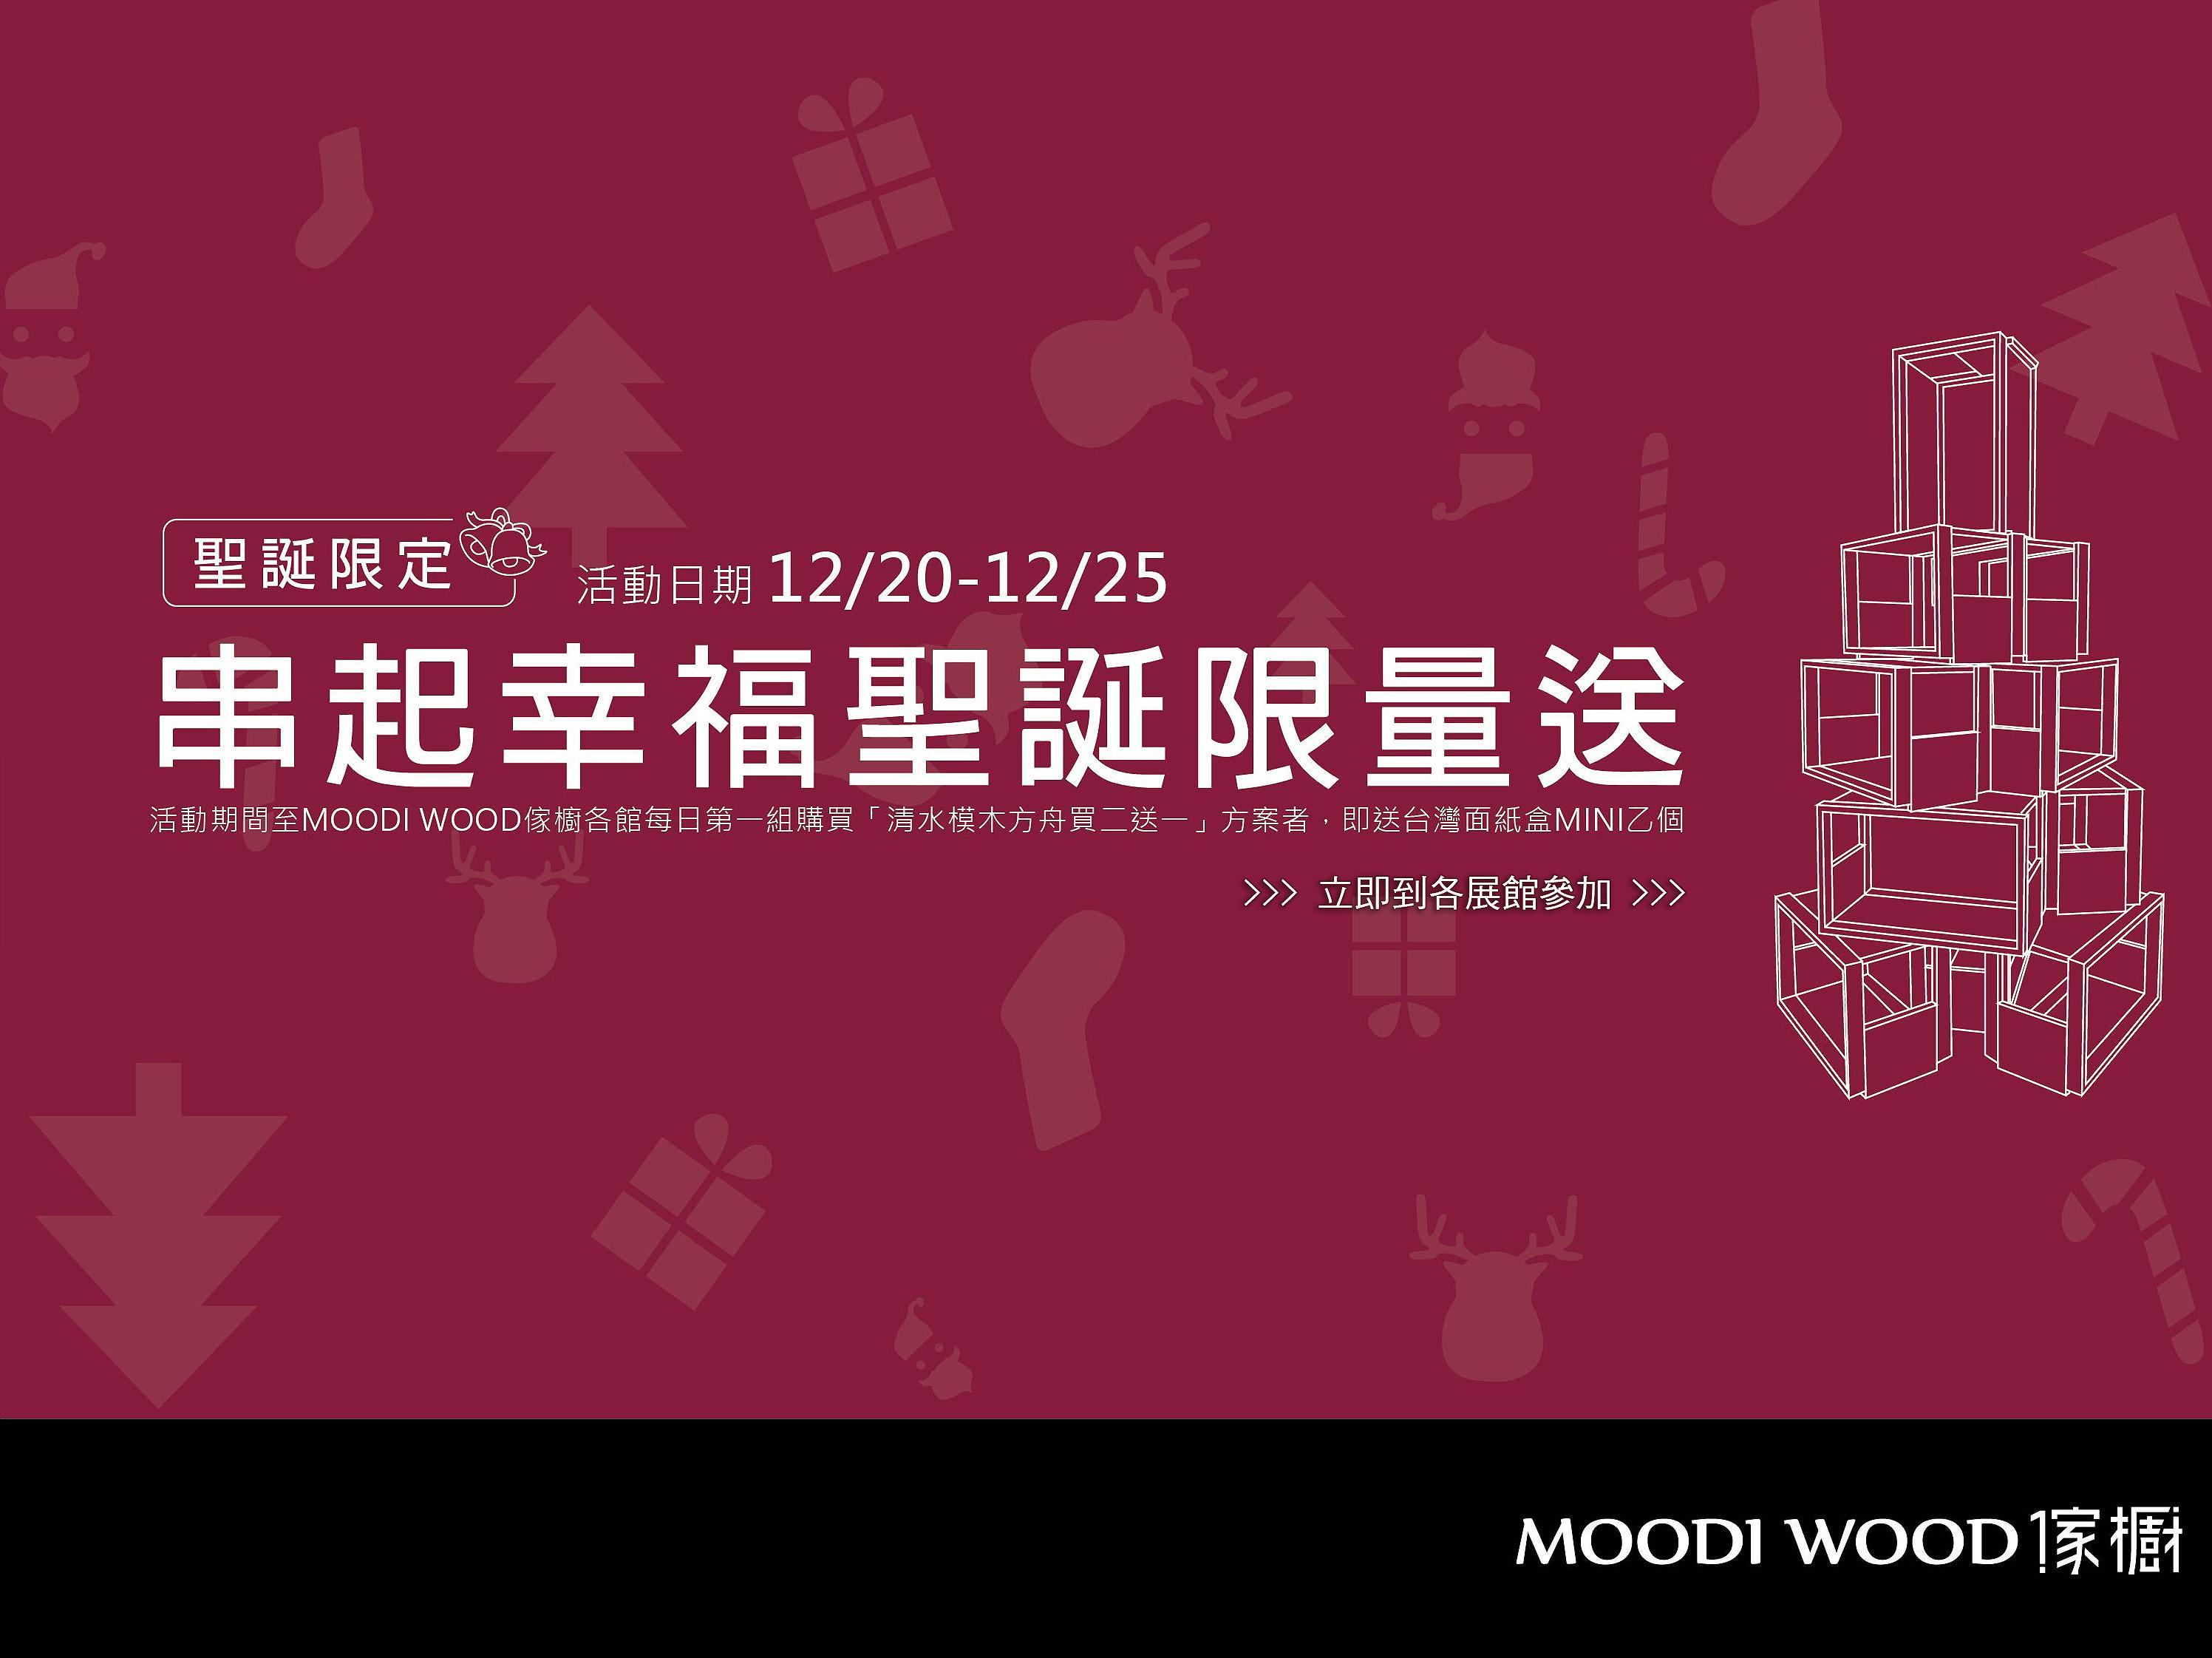 MOODI WOOD Image 03